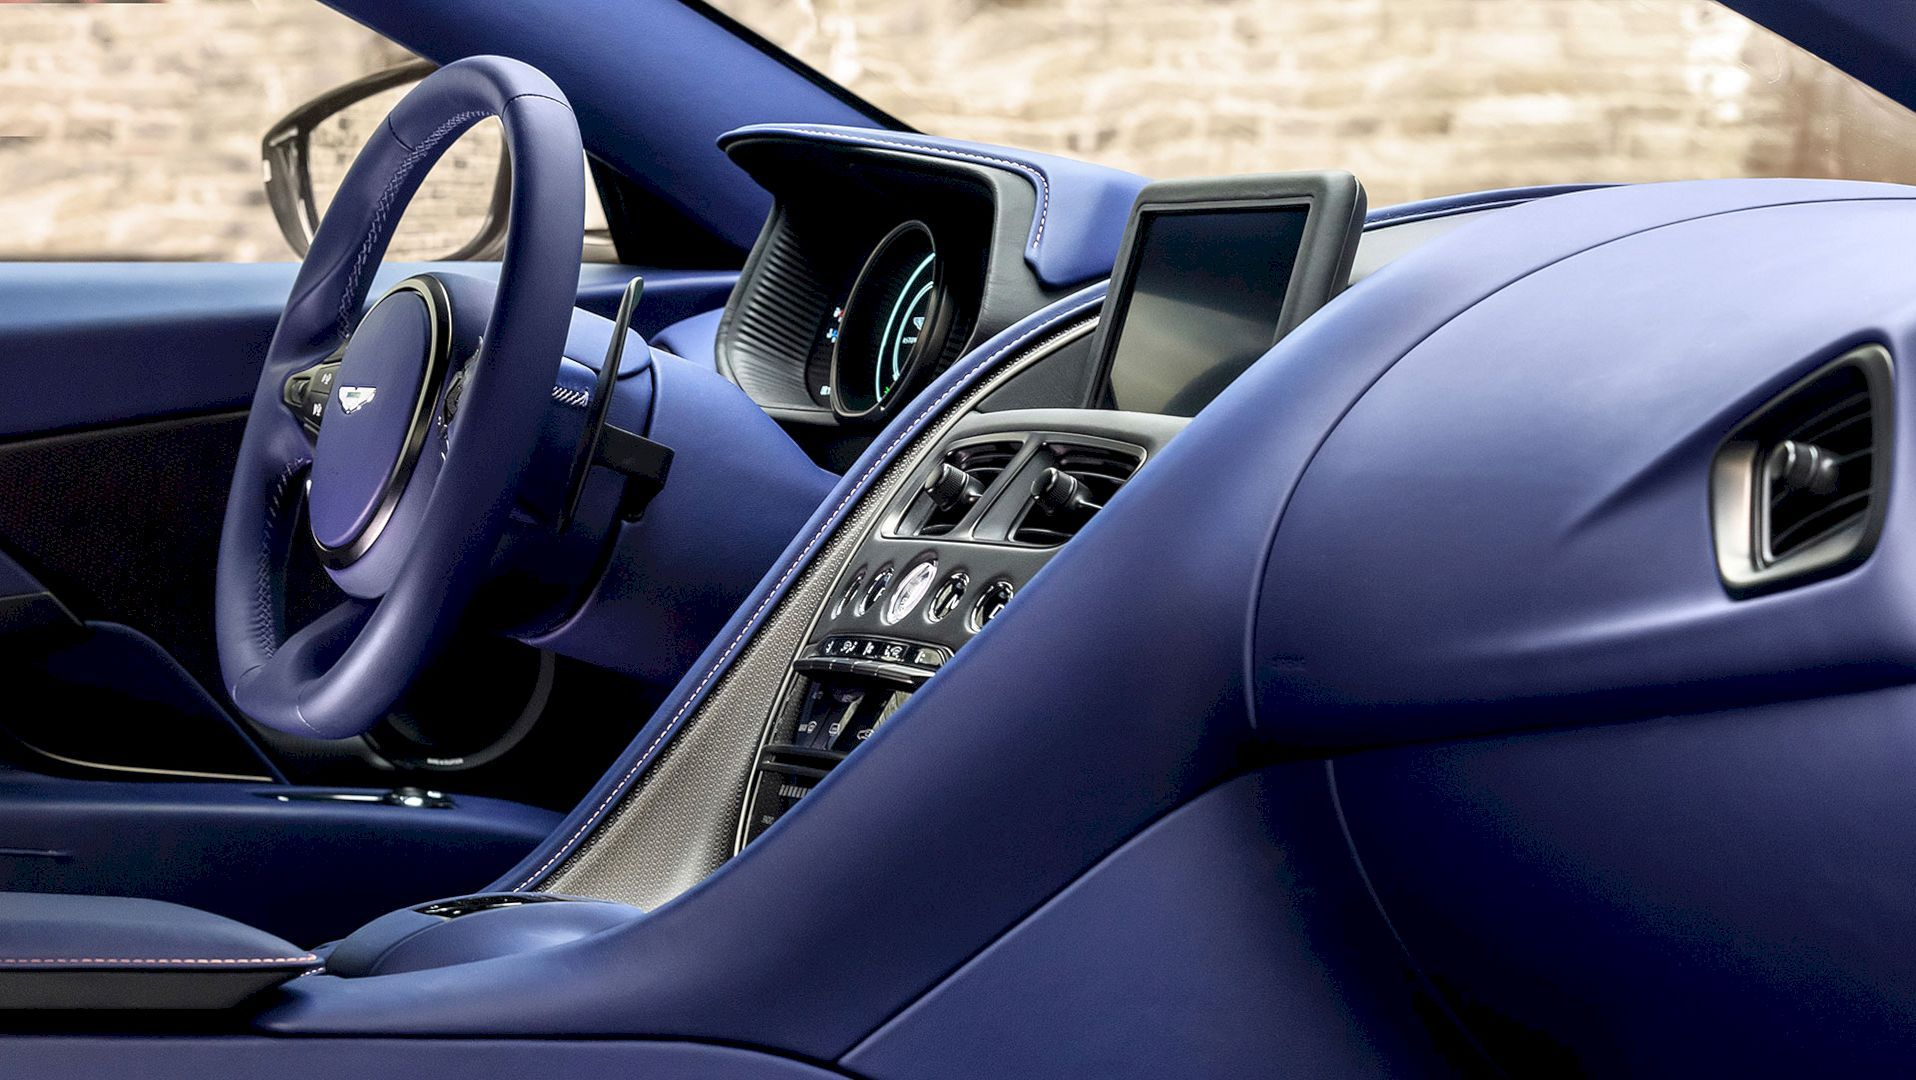 Aston Martin Db 11 Shape Space Sound Aston Martin Db11 Aston Martin New Aston Martin